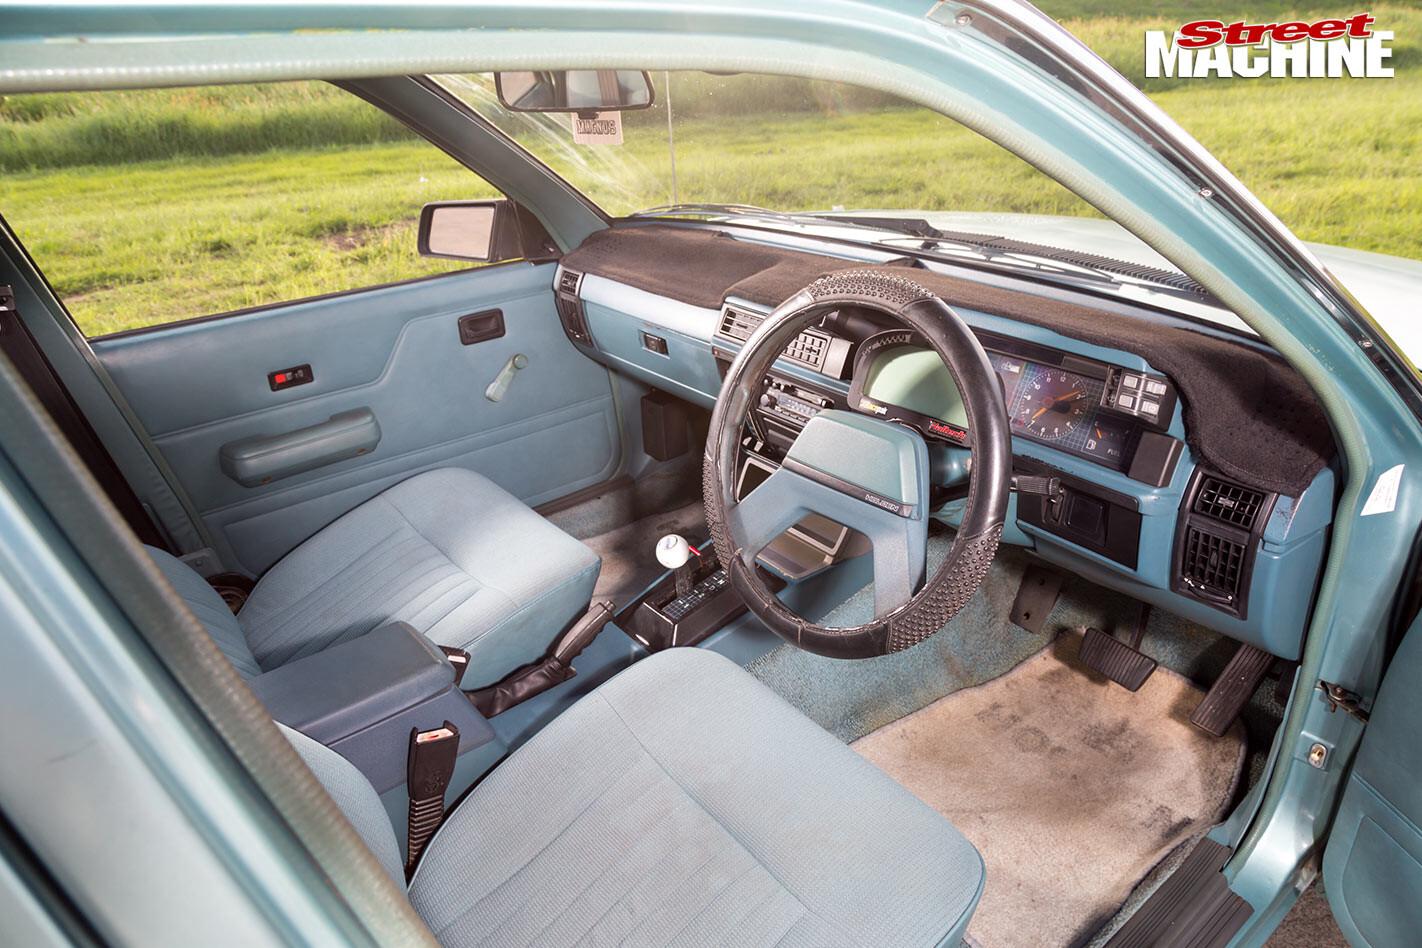 Holden VL Commodore interior front